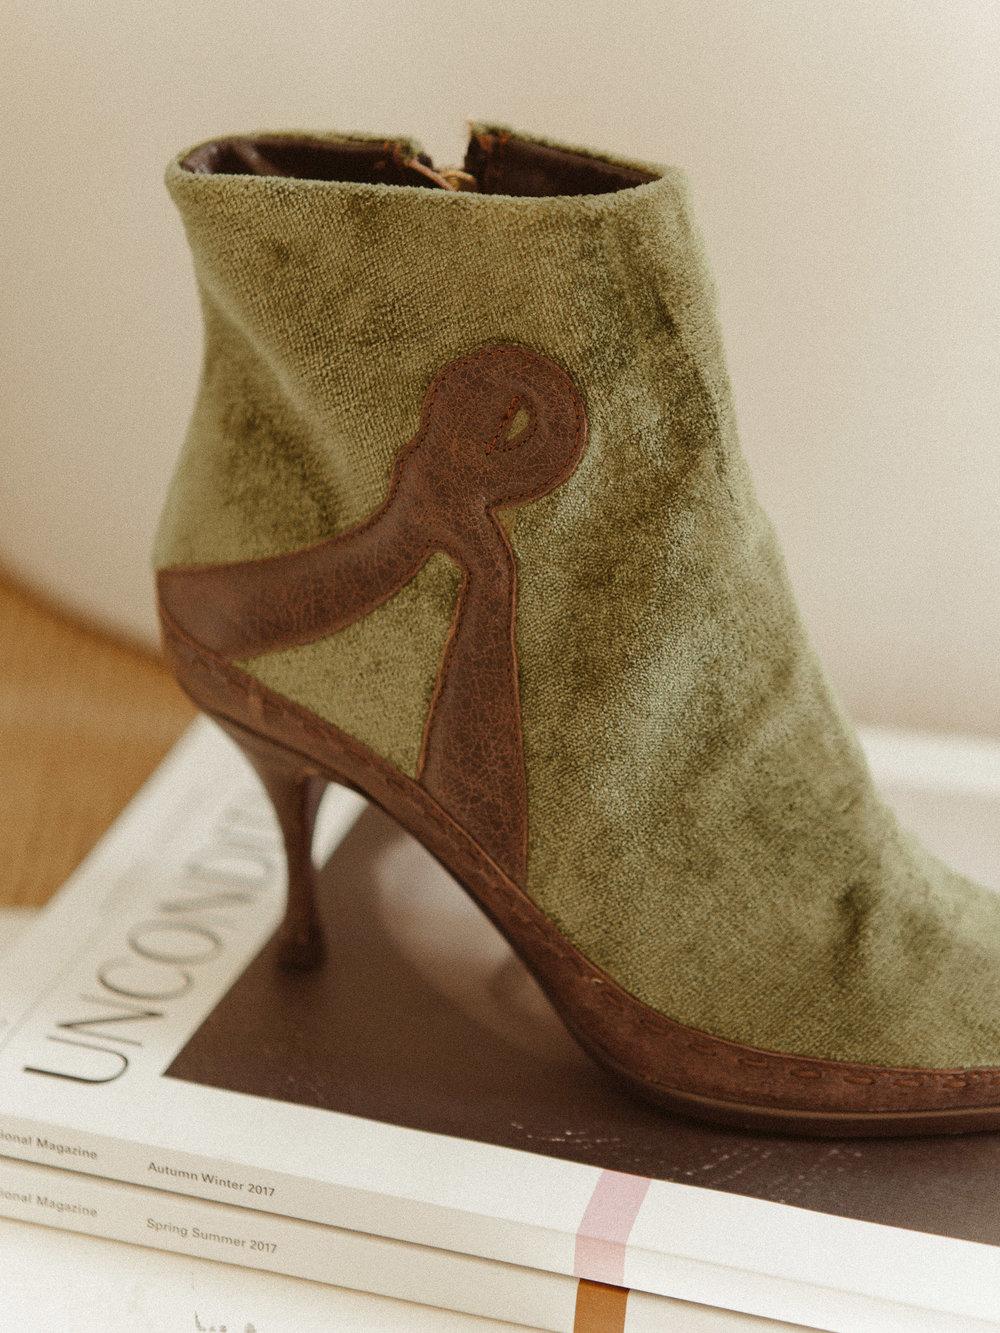 Vintage Roberta Di Camerino Booties (8 1/2) $475 -